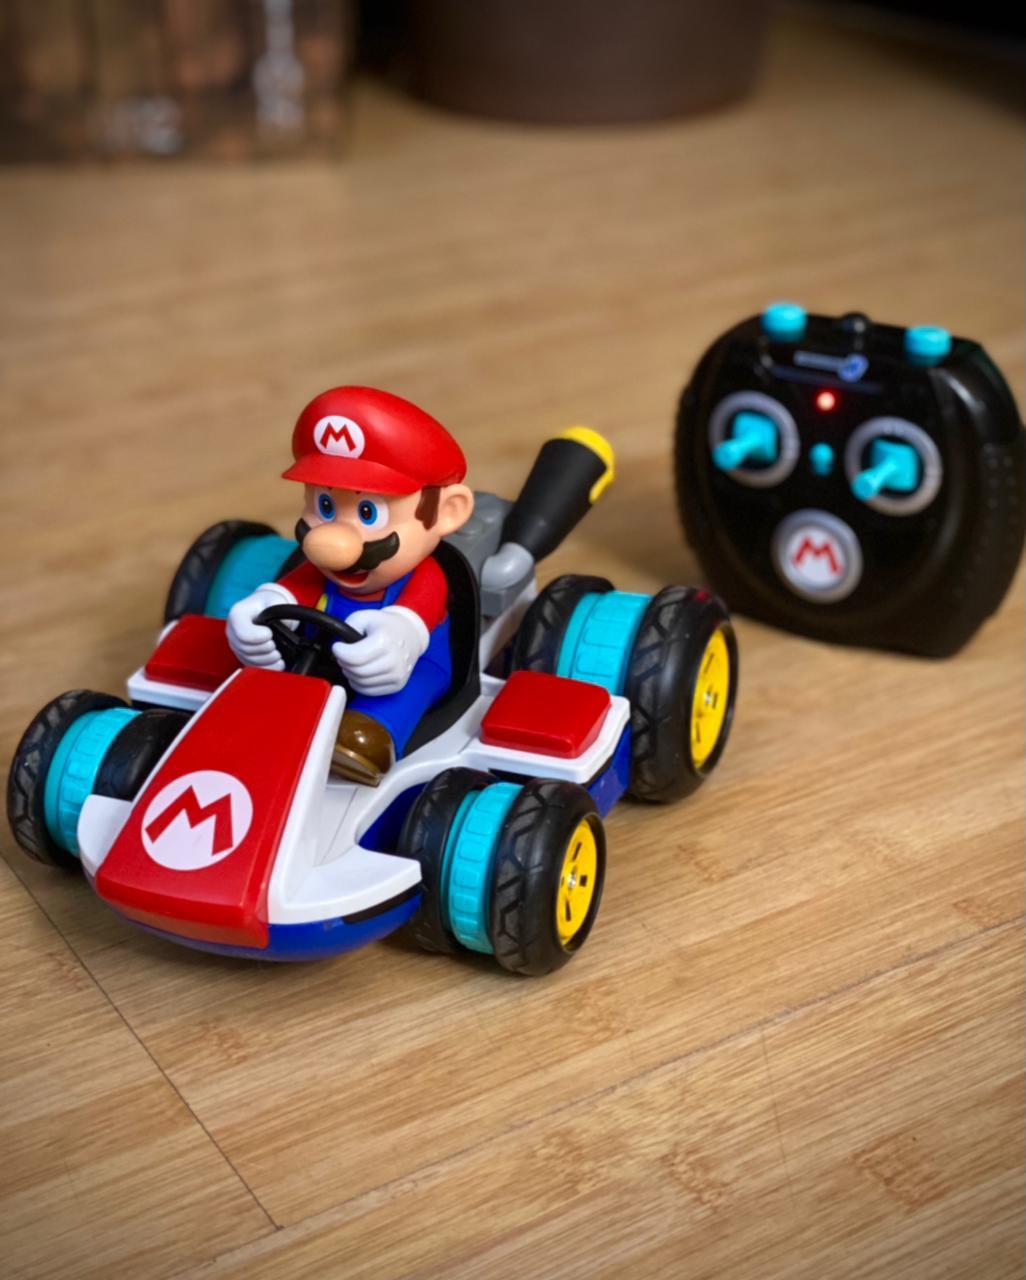 Brinquedo Carro Carrinho Controle Remoto Mario Anti-Gravity R/C Racer: Mario Kart Mario Bros- Jakks Pacific